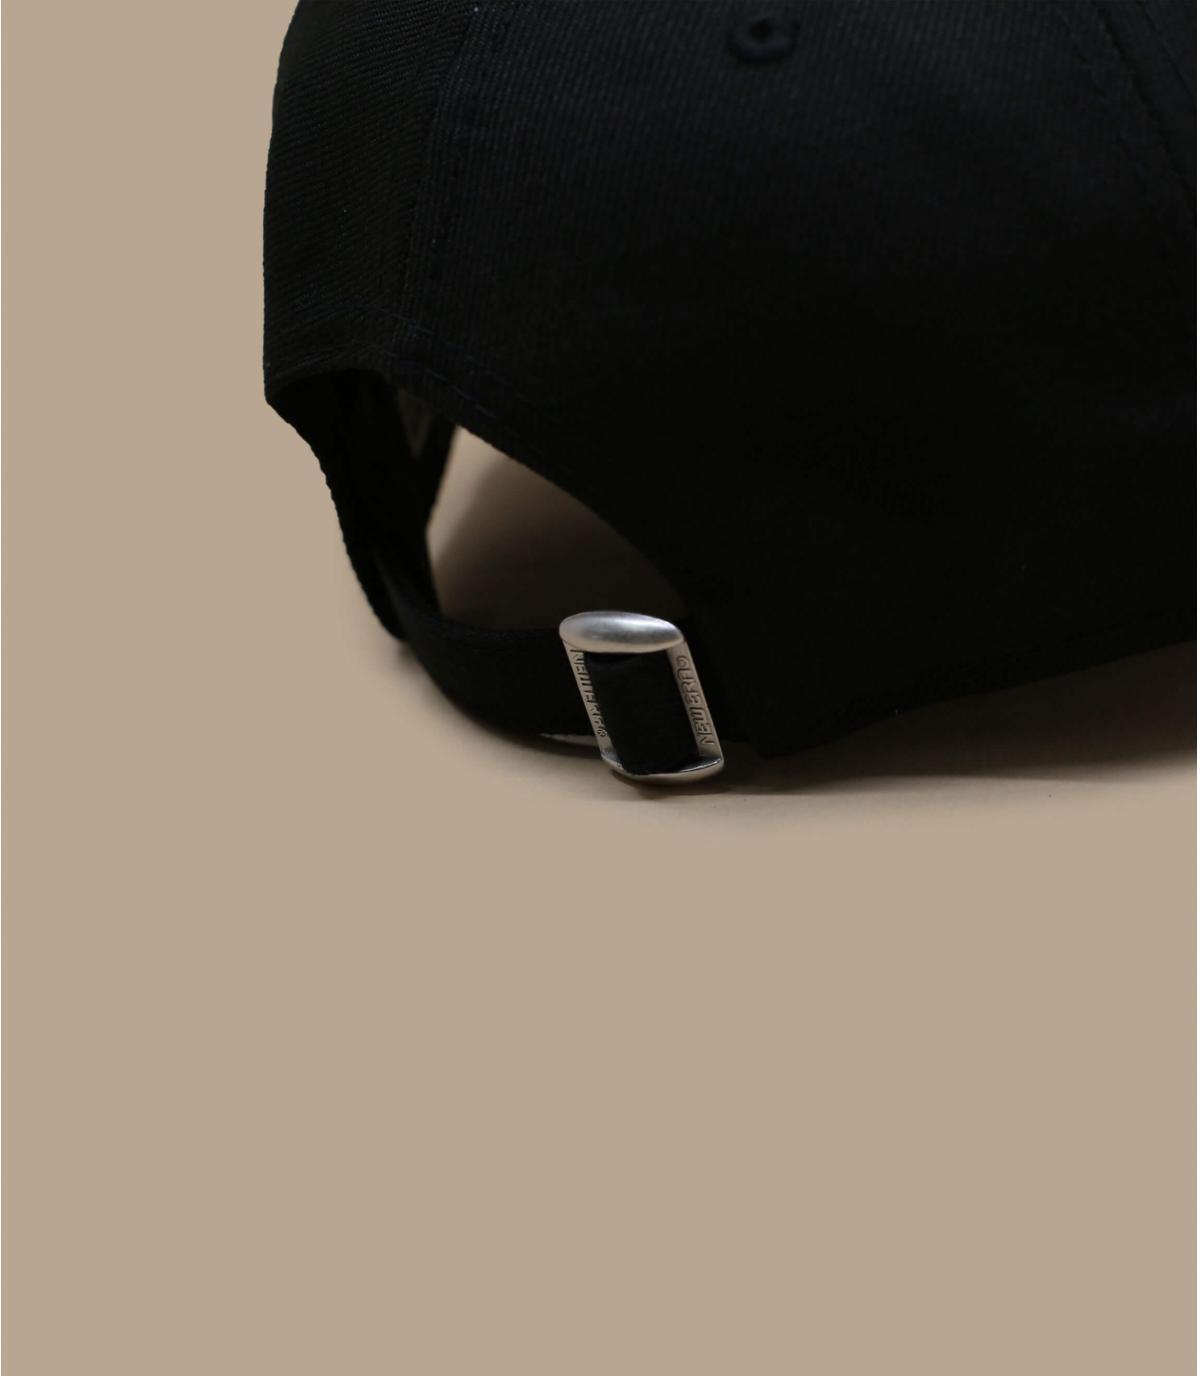 Details Neon Pack NY 940 black green - Abbildung 4